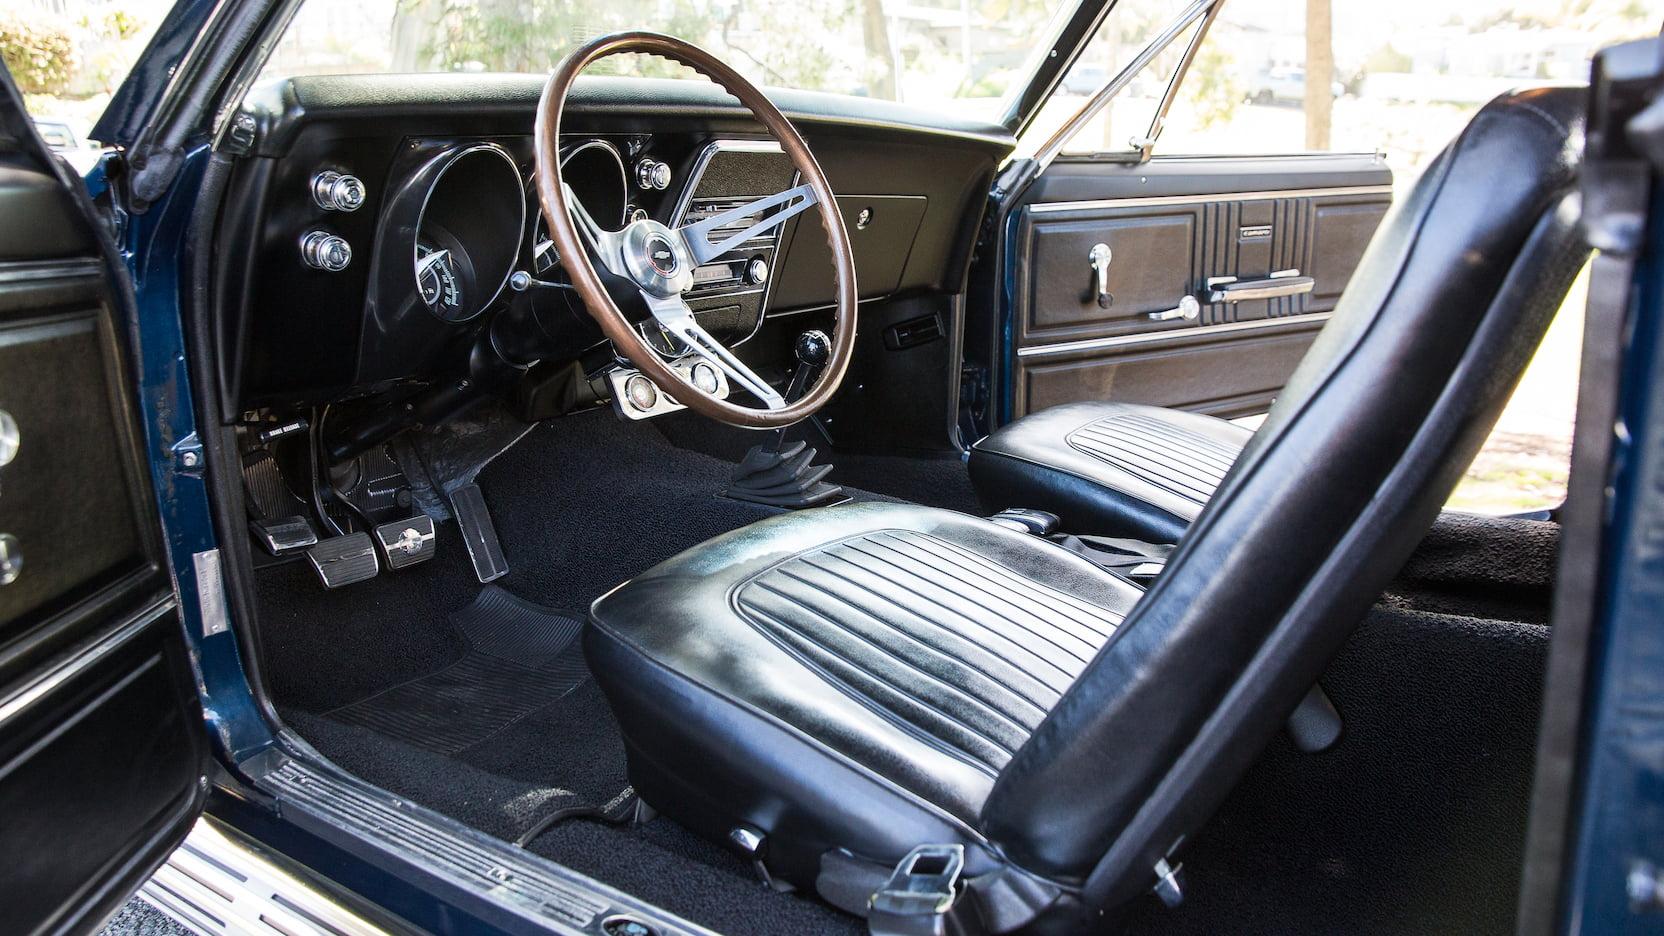 1967 Chevrolet Yenko Camaro interior